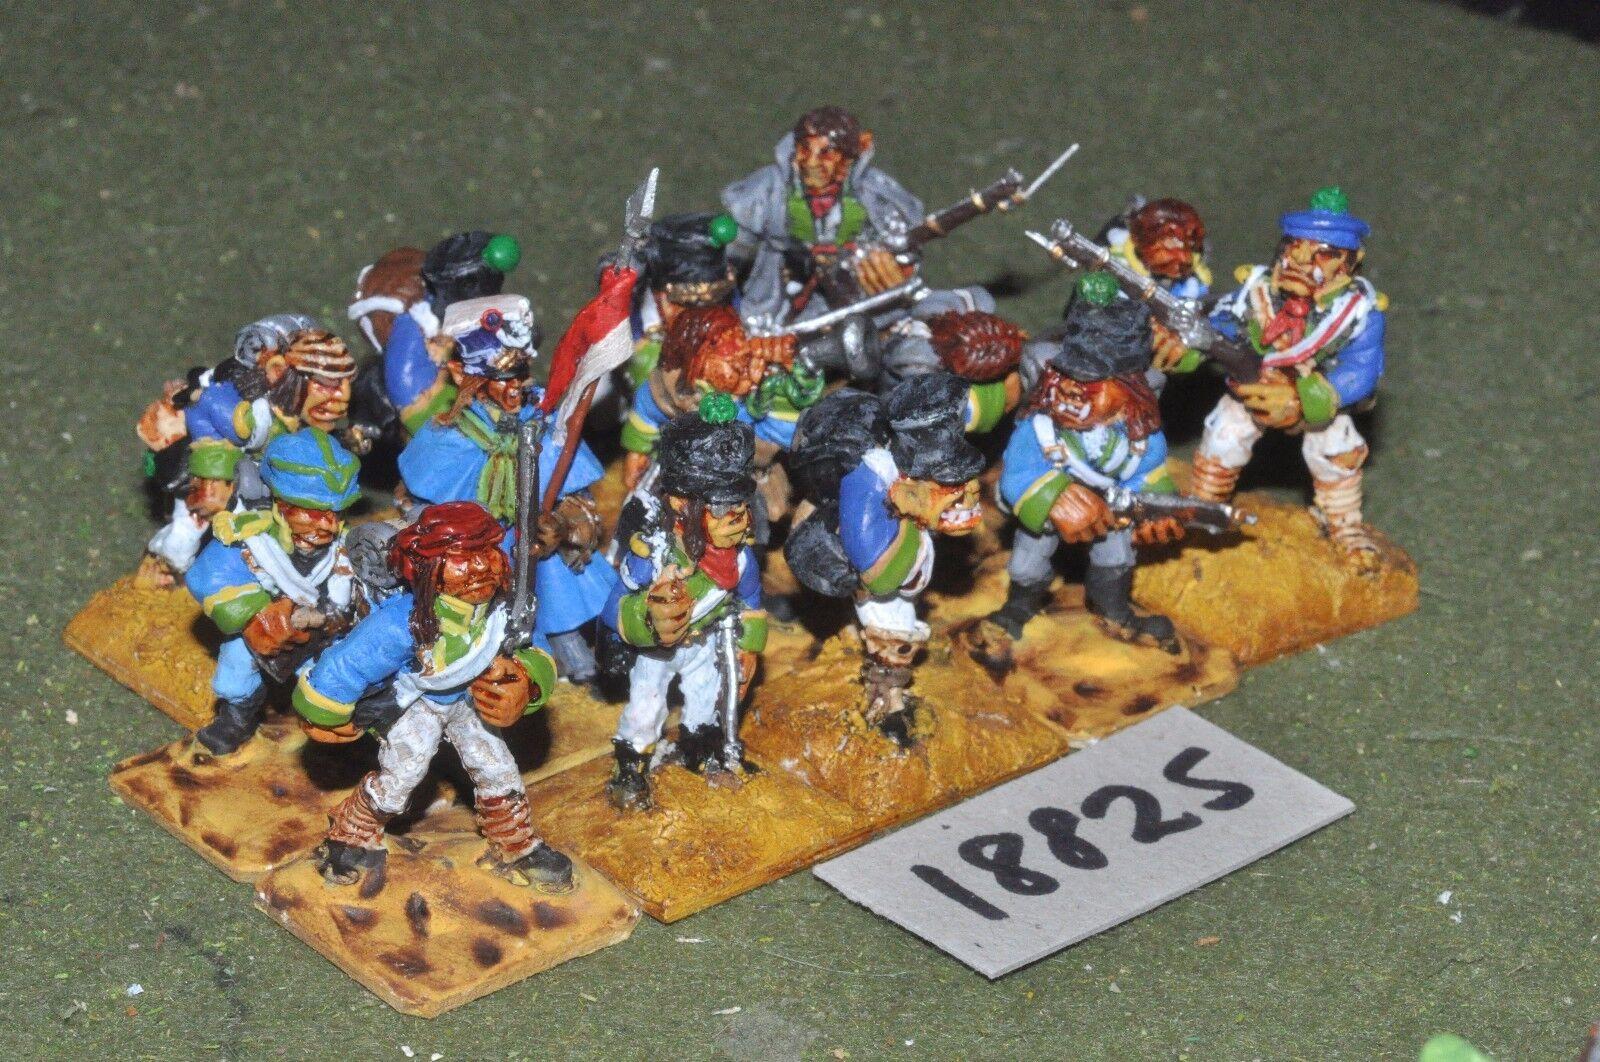 Flintloque fantasy orc giunelean legion voltiguers 14 infantry {16} (18825)